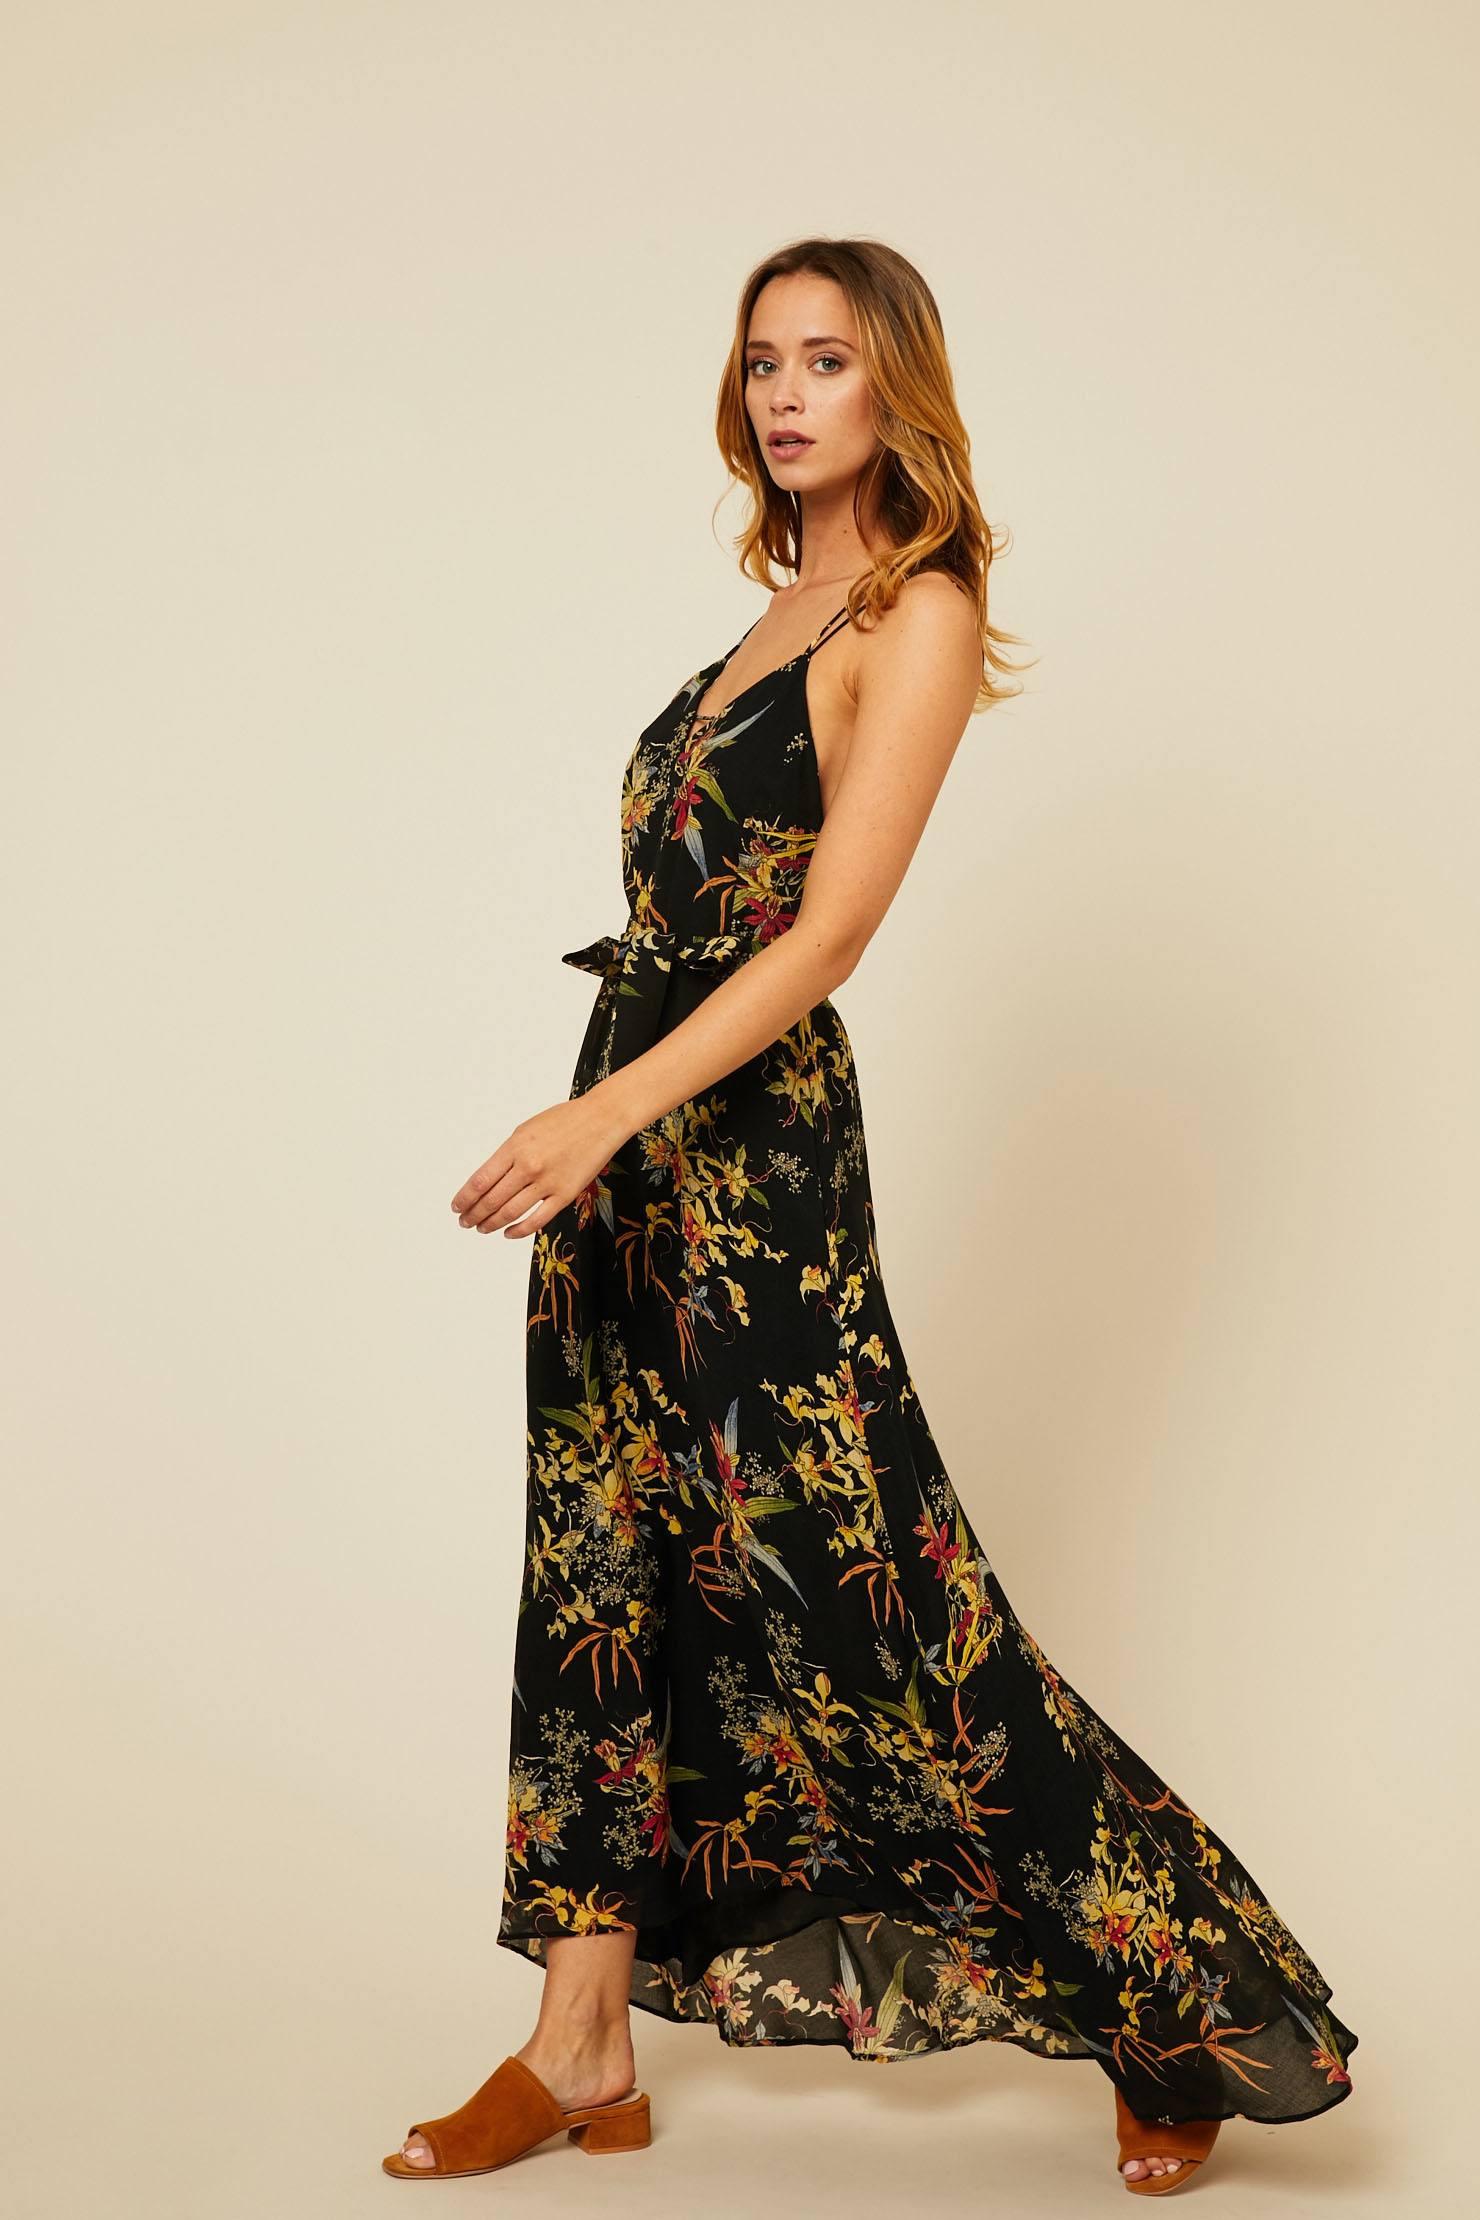 b476baa126bb8a Ikks women Robe longue en voile imprimé floral noir - Robe Monshowroom